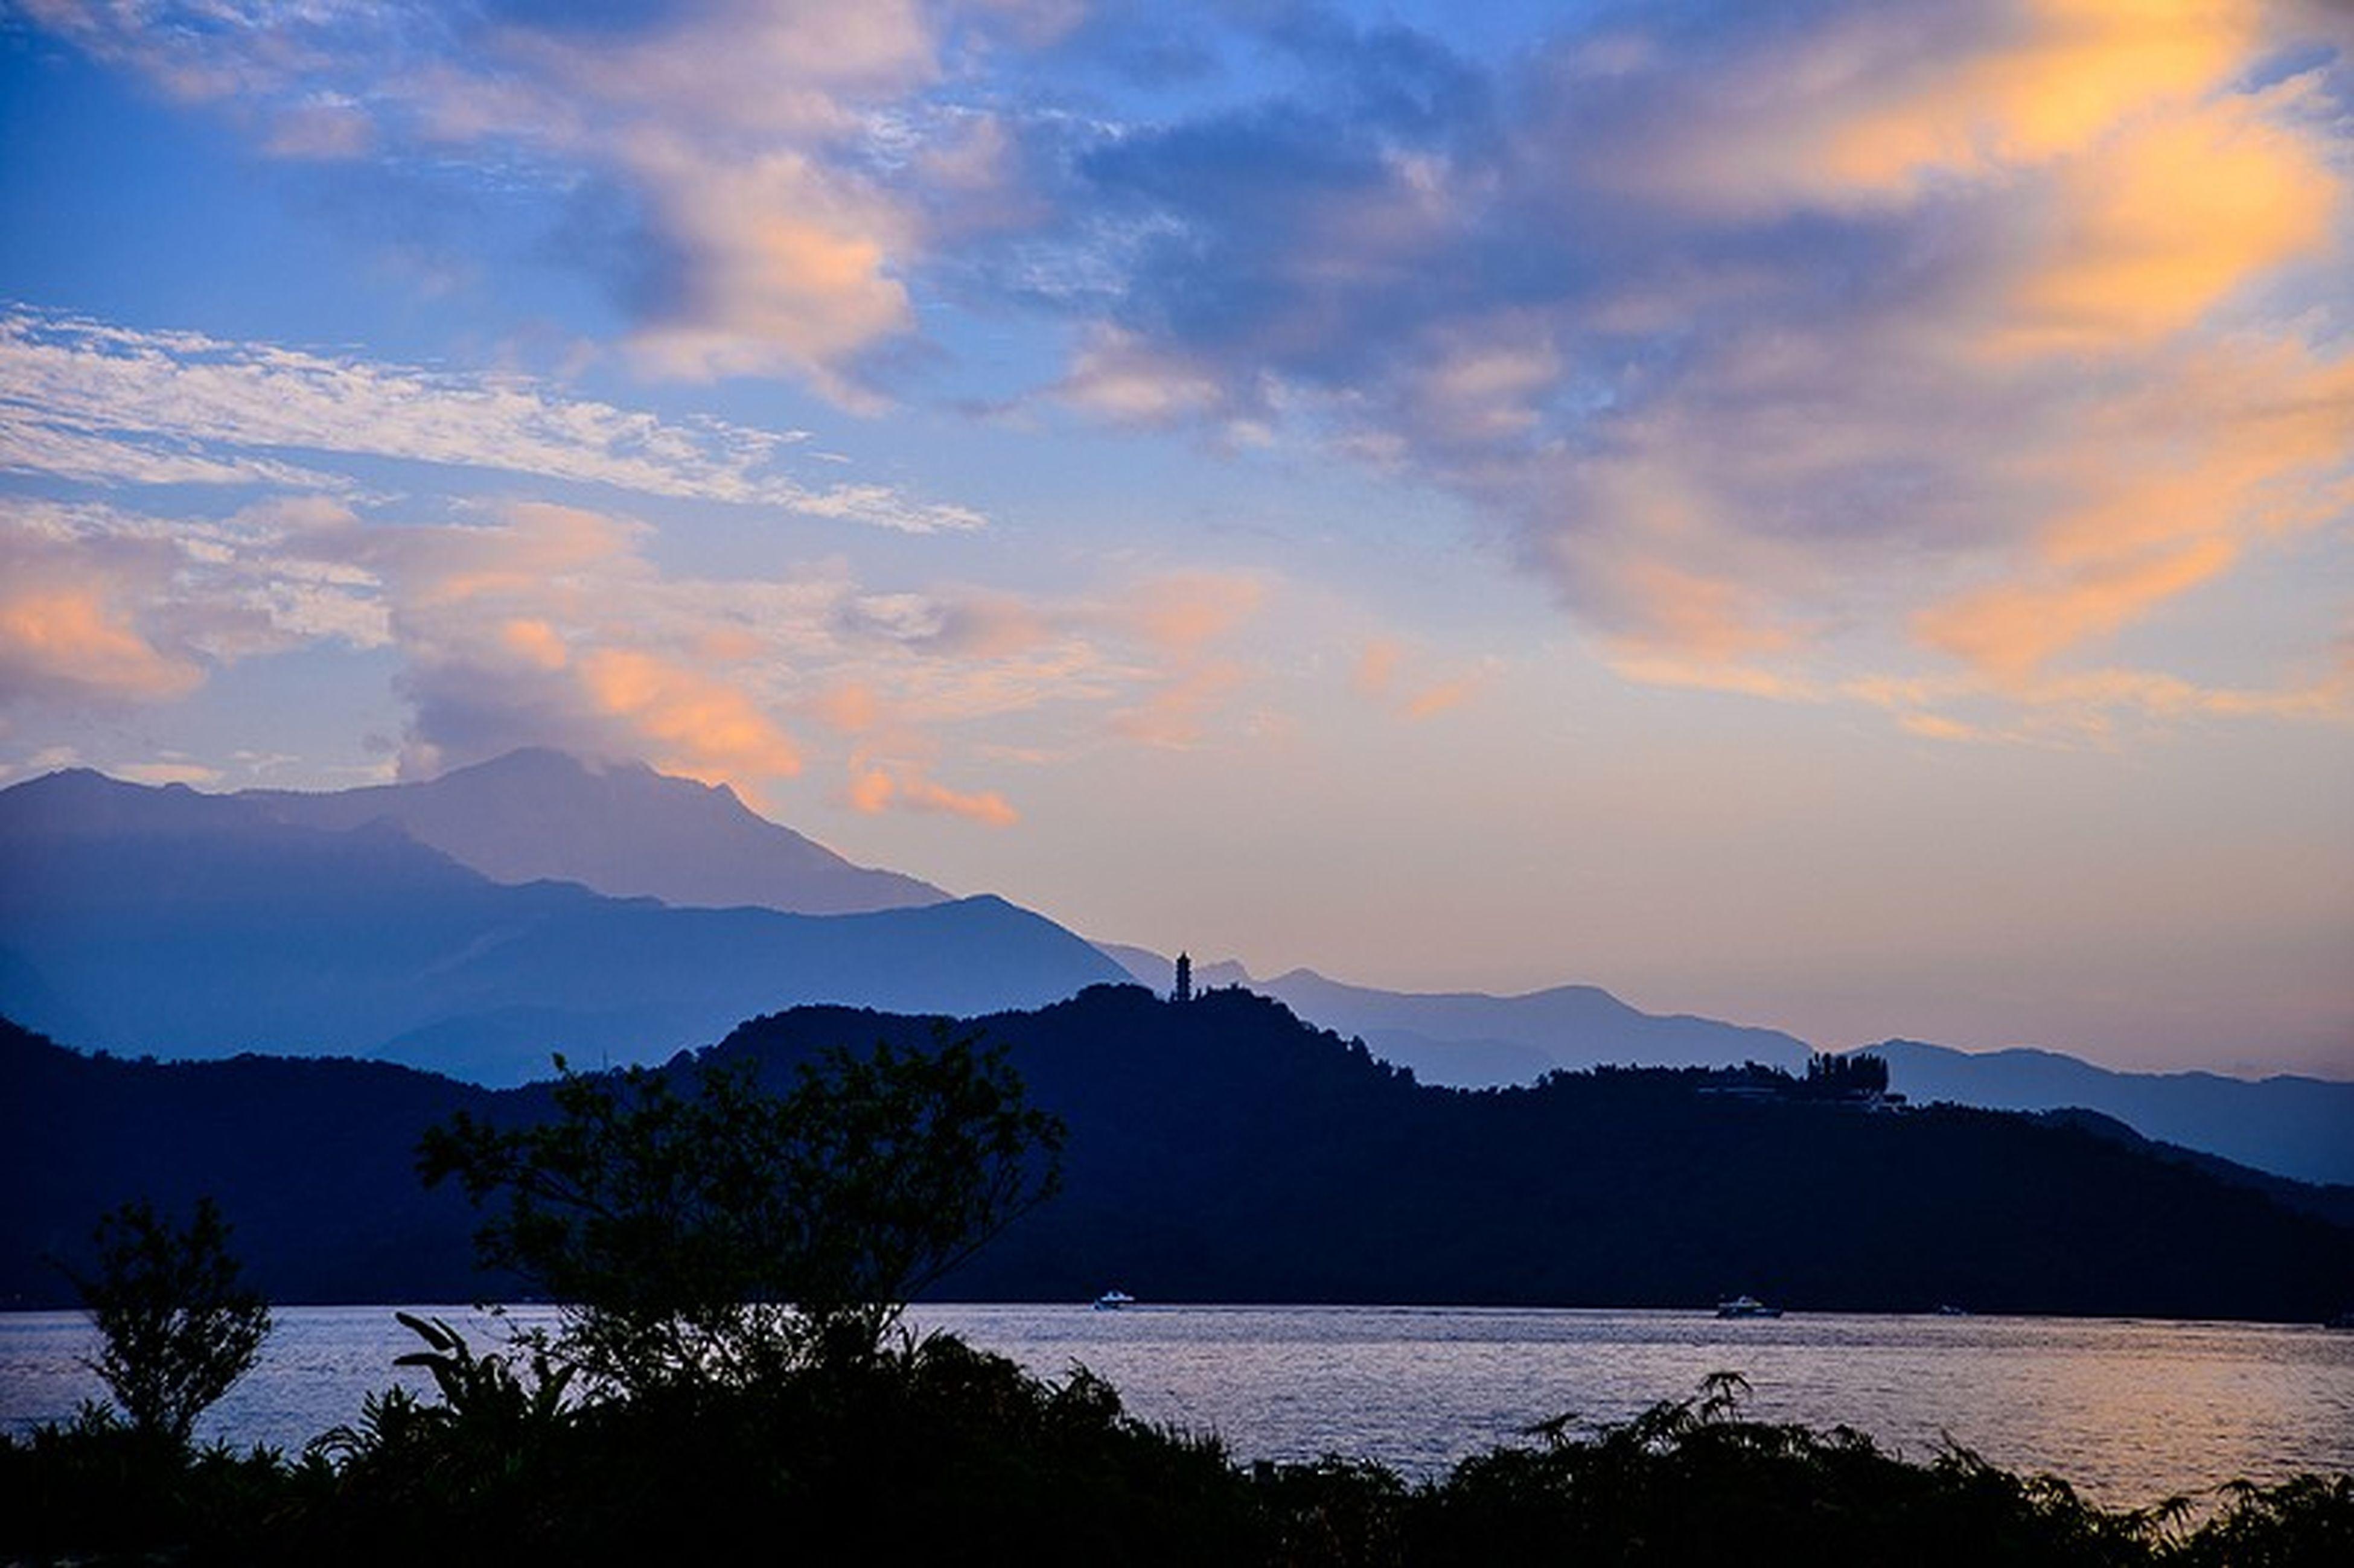 mountain, tranquil scene, scenics, tranquility, beauty in nature, silhouette, sunset, mountain range, water, sky, lake, nature, idyllic, cloud - sky, cloud, non-urban scene, dusk, majestic, landscape, reflection